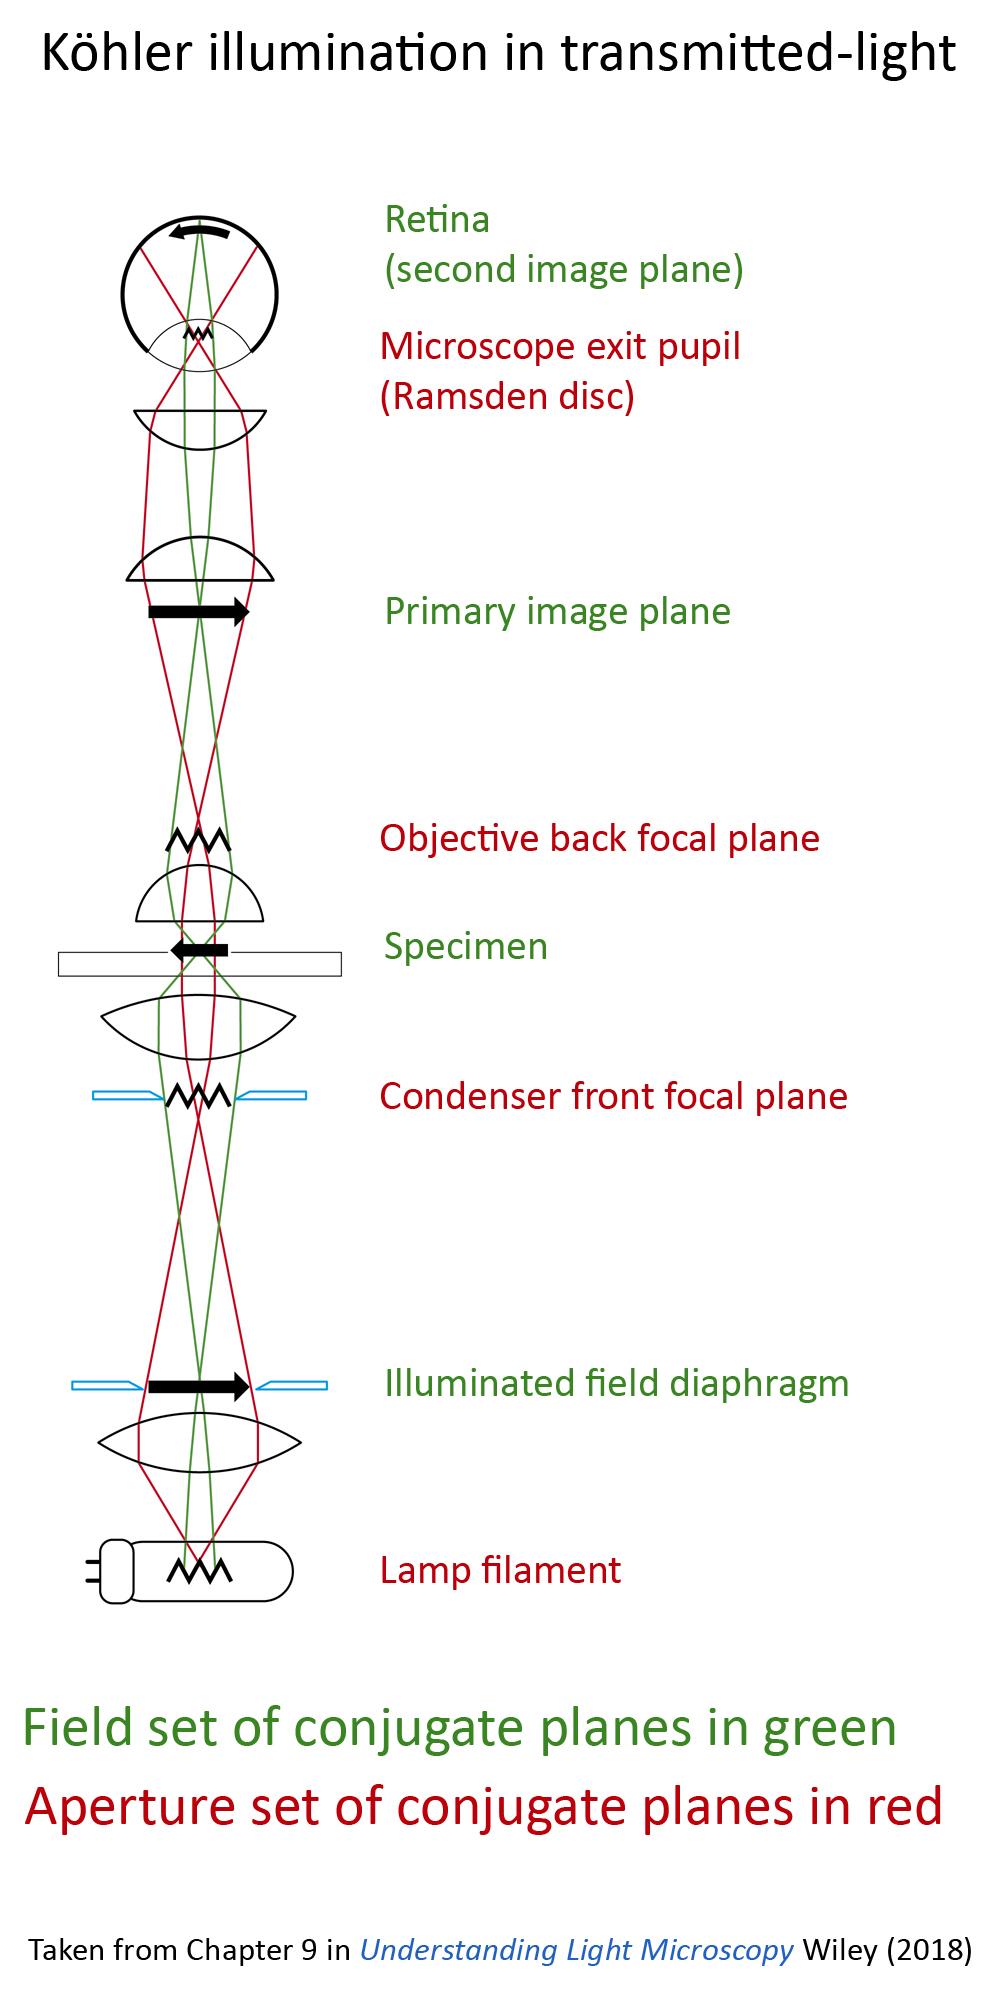 Kohler ray path